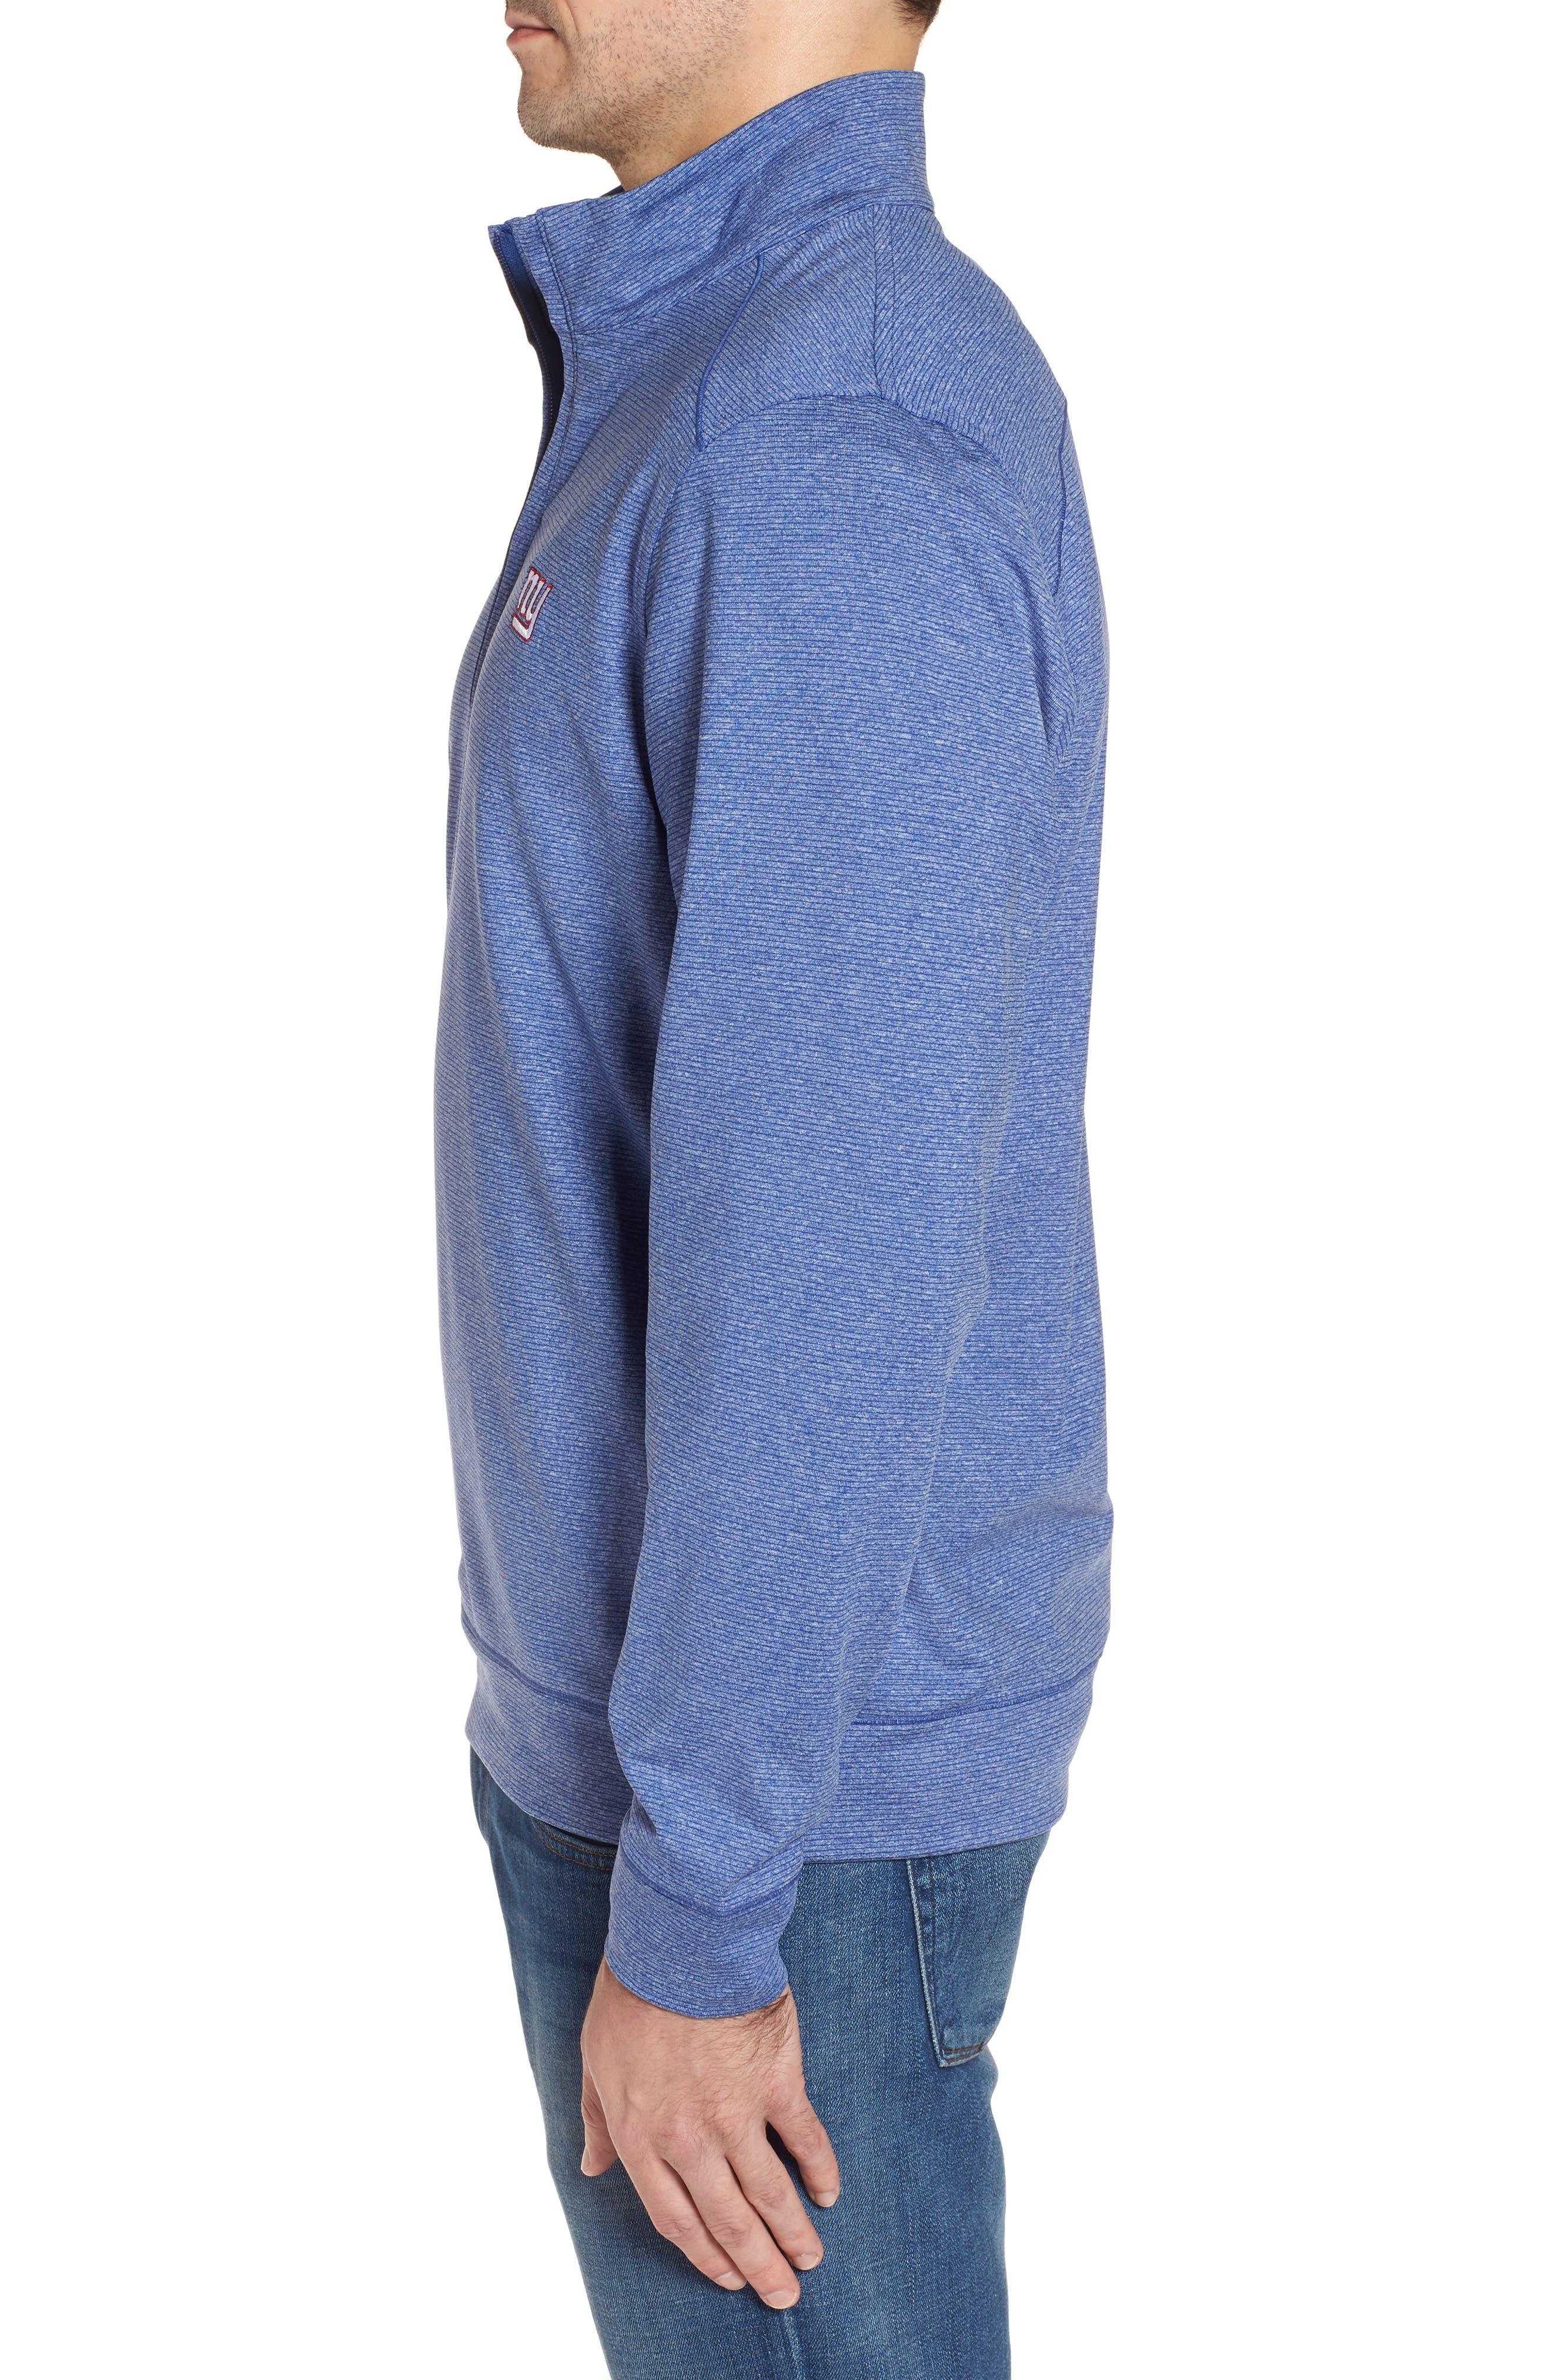 Shoreline - New York Giants Half Zip Pullover,                             Alternate thumbnail 3, color,                             Tour Blue Heather